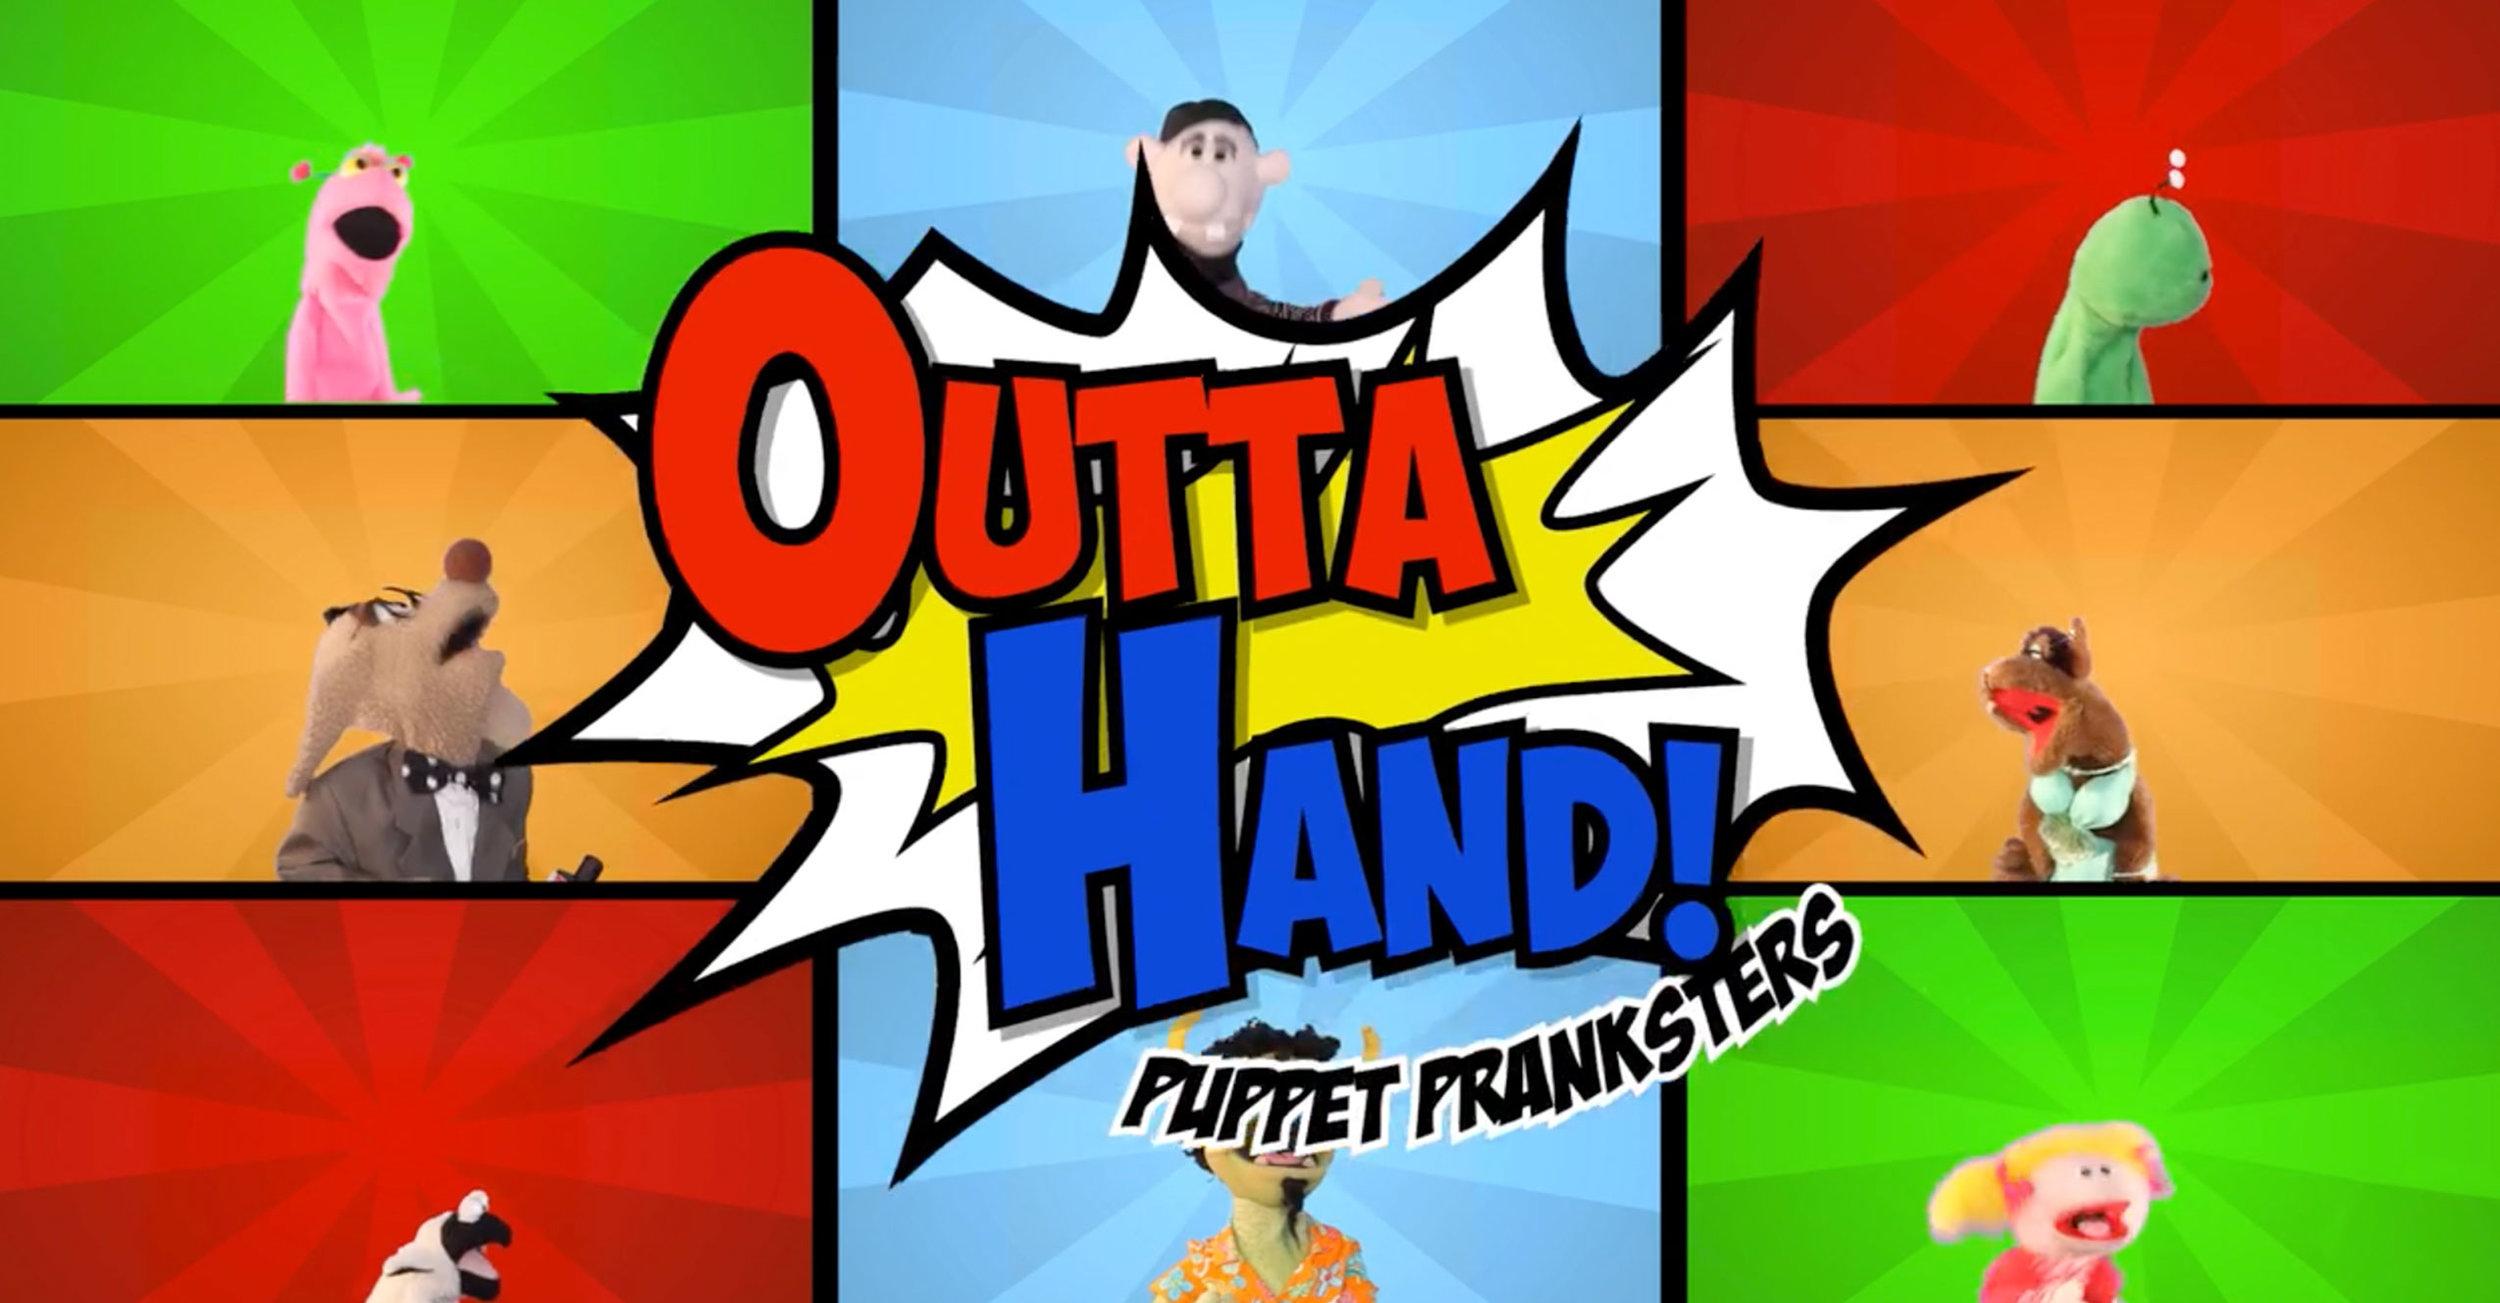 VT_outta hand_banner.jpg